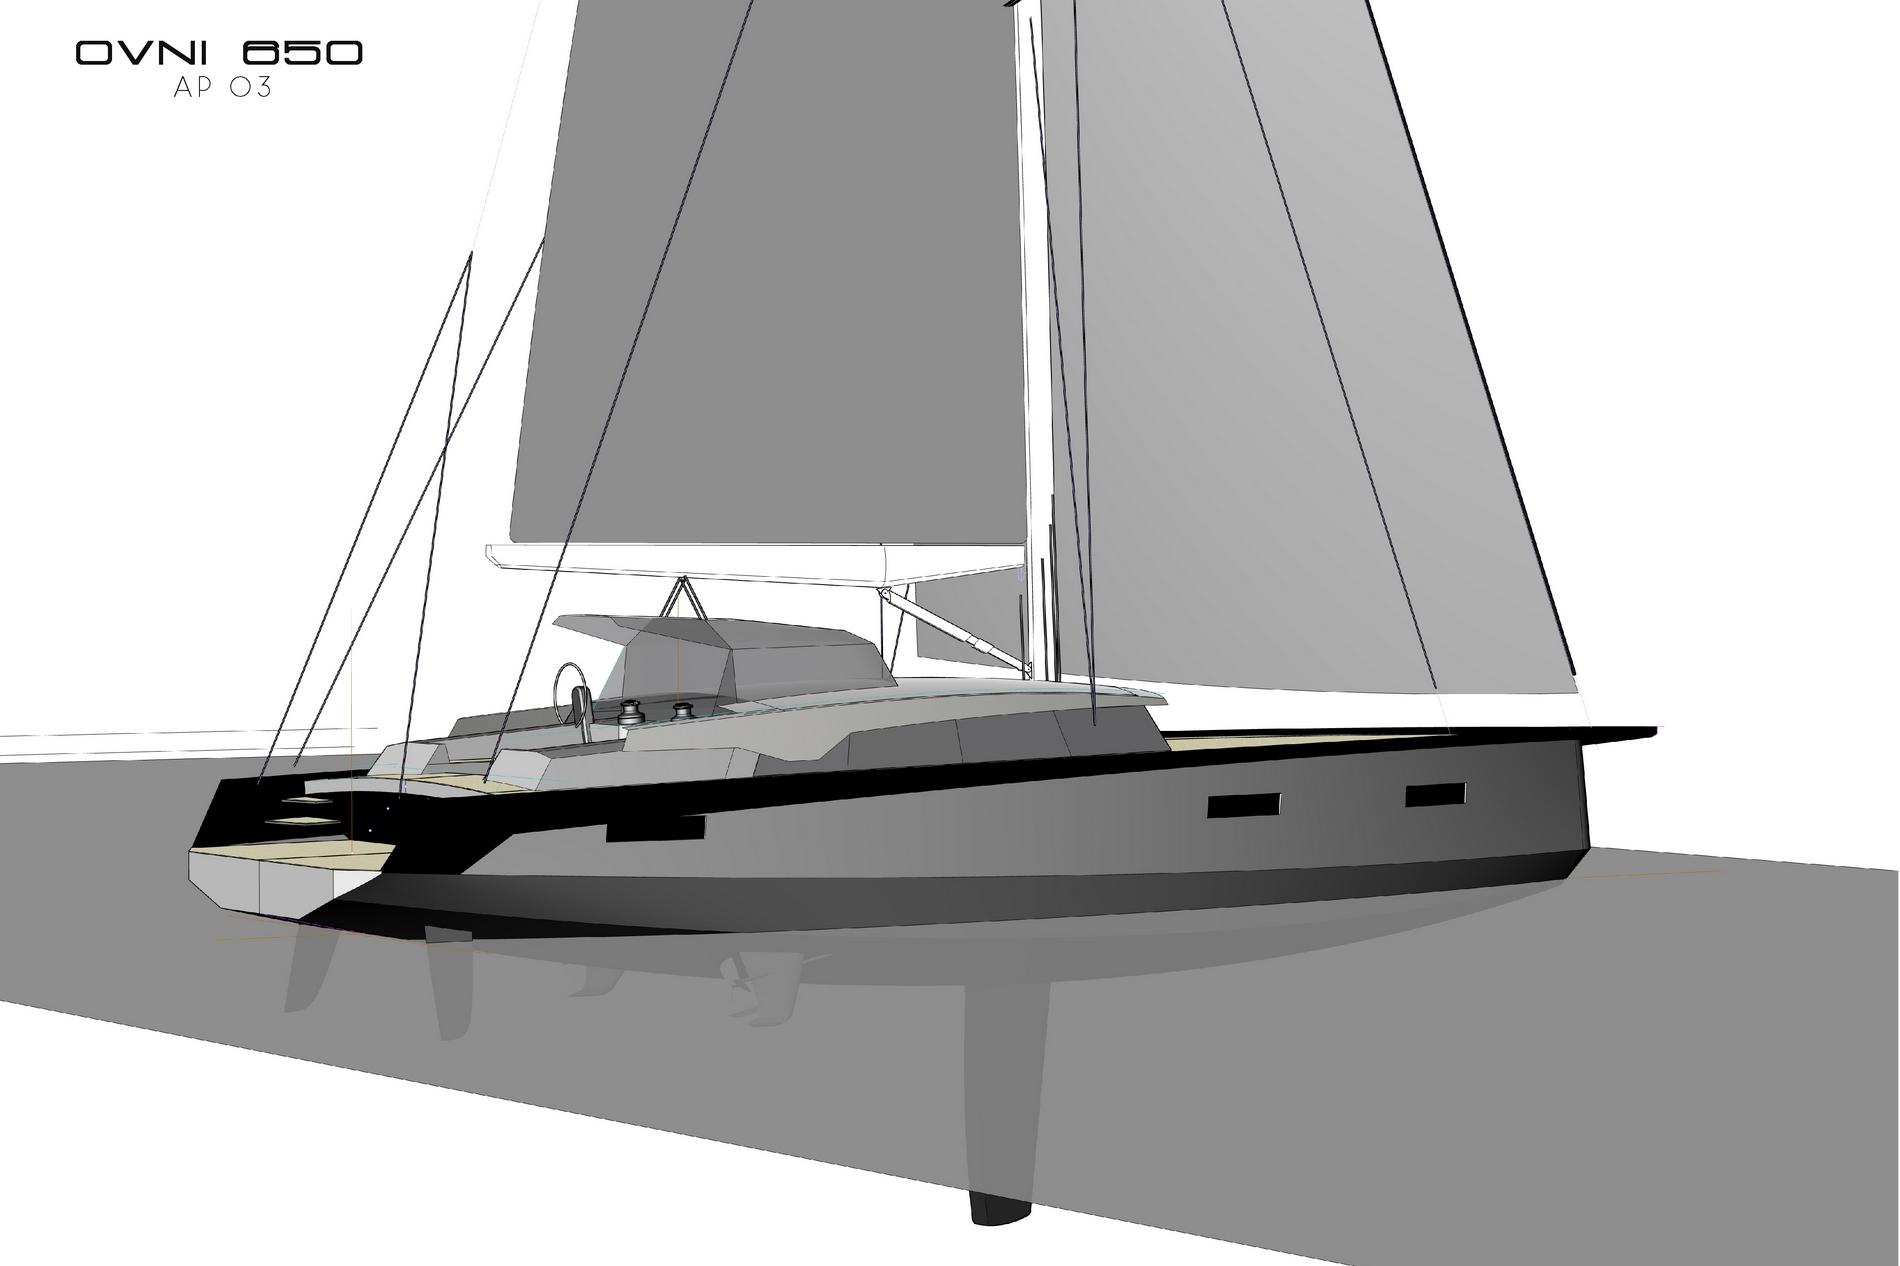 My custom-made sailboat